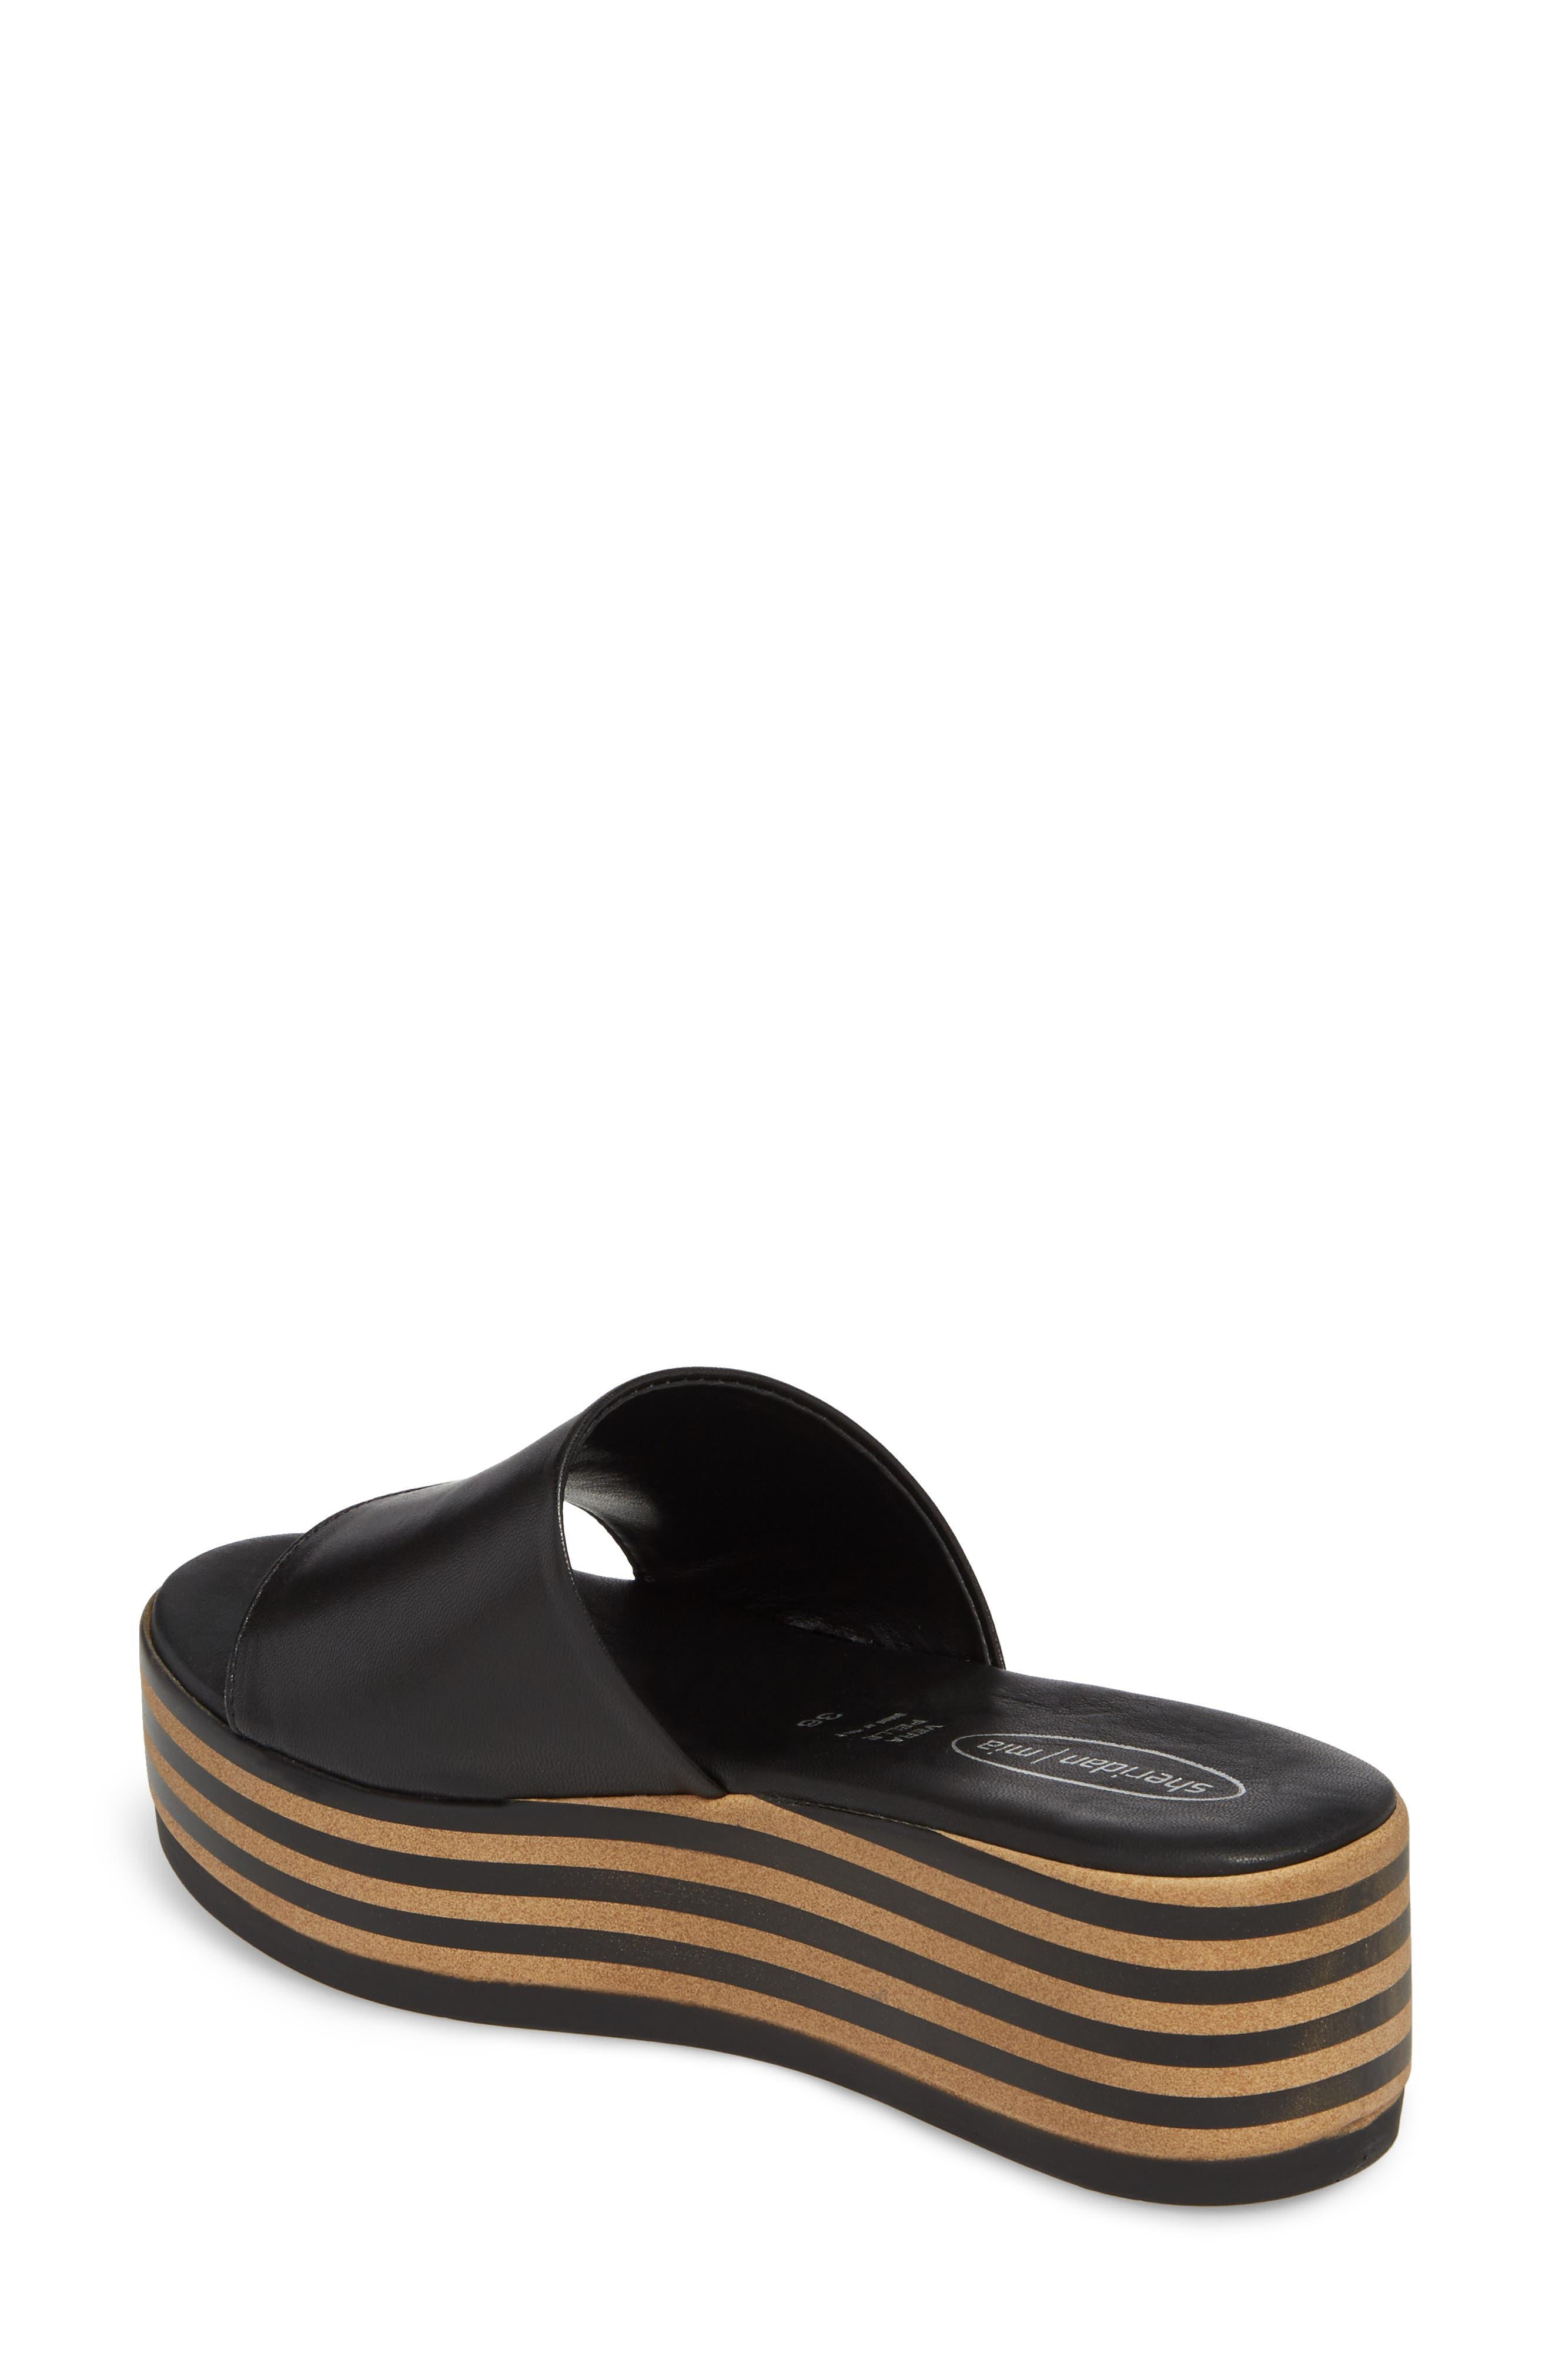 Reesa Platform Slide Sandal,                             Alternate thumbnail 2, color,                             Black Leather